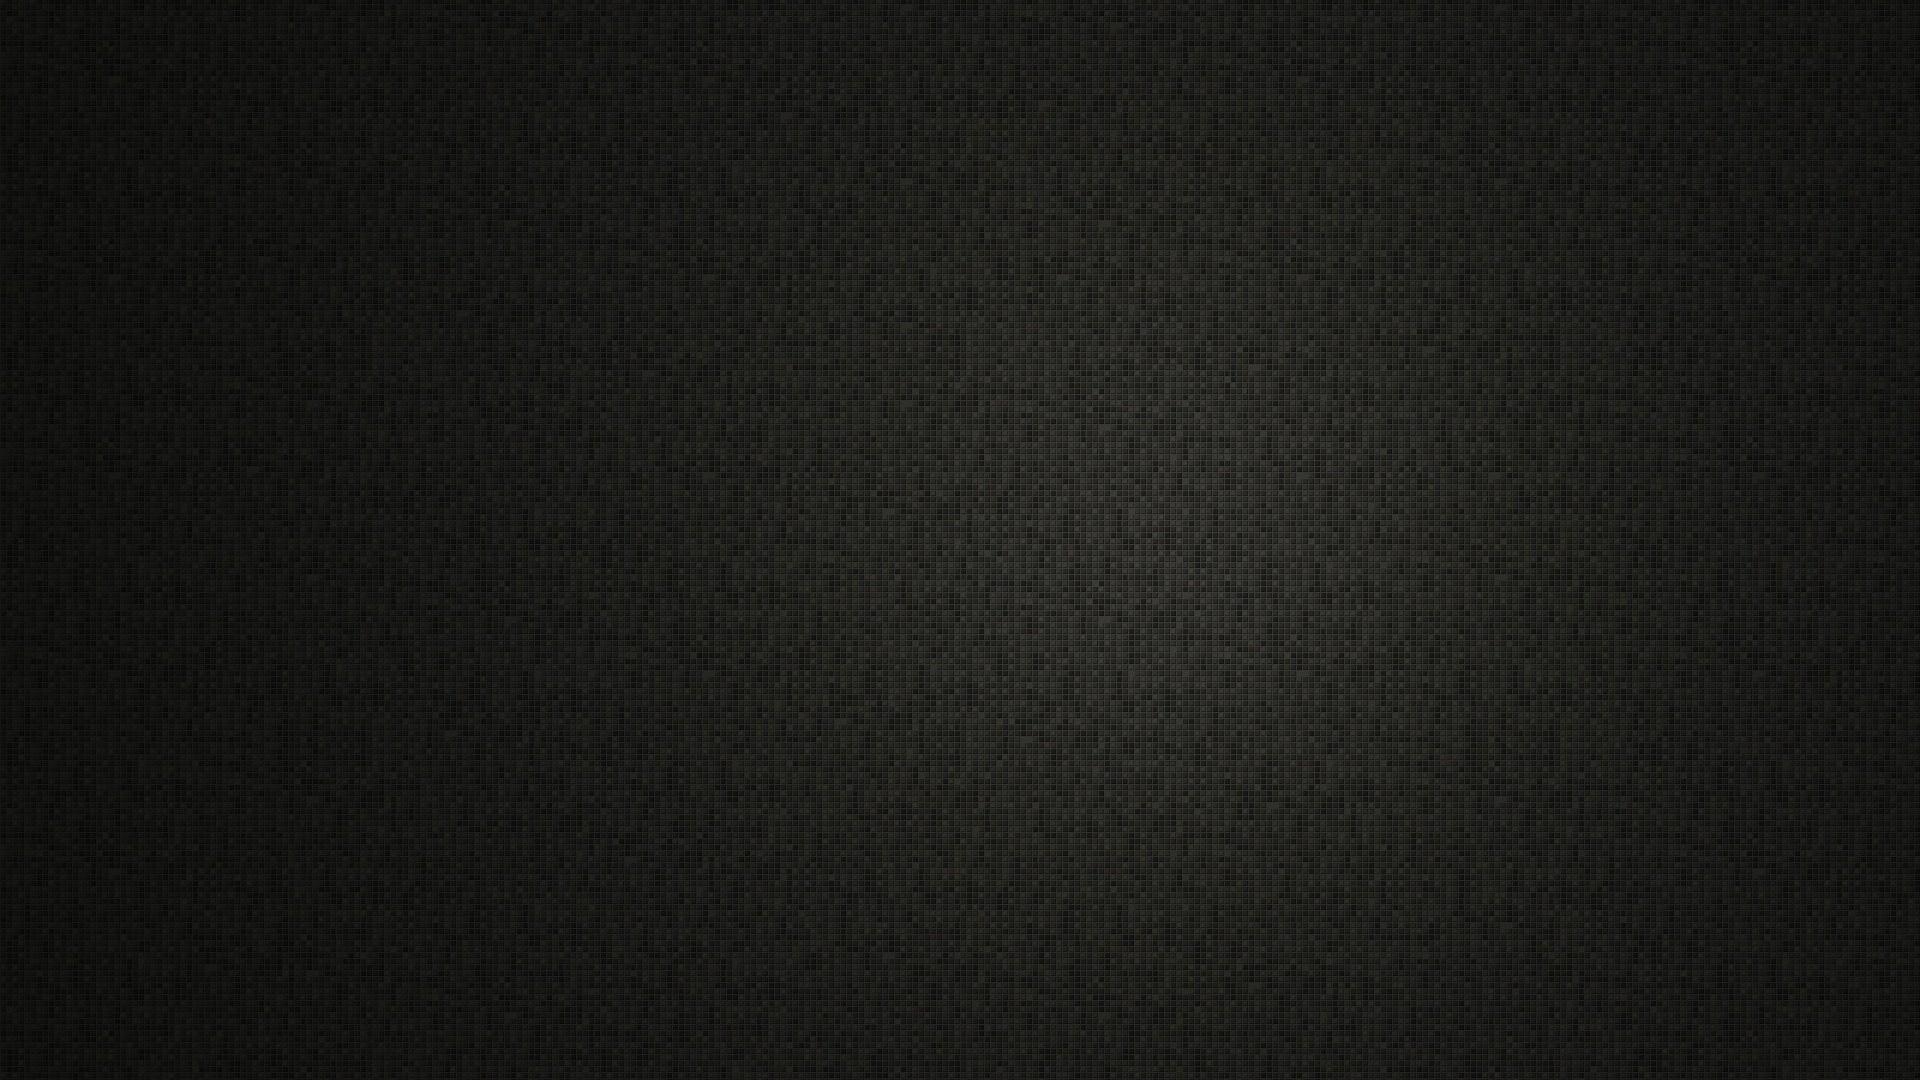 42+ Dark Grey Textured Wallpaper on WallpaperSafari